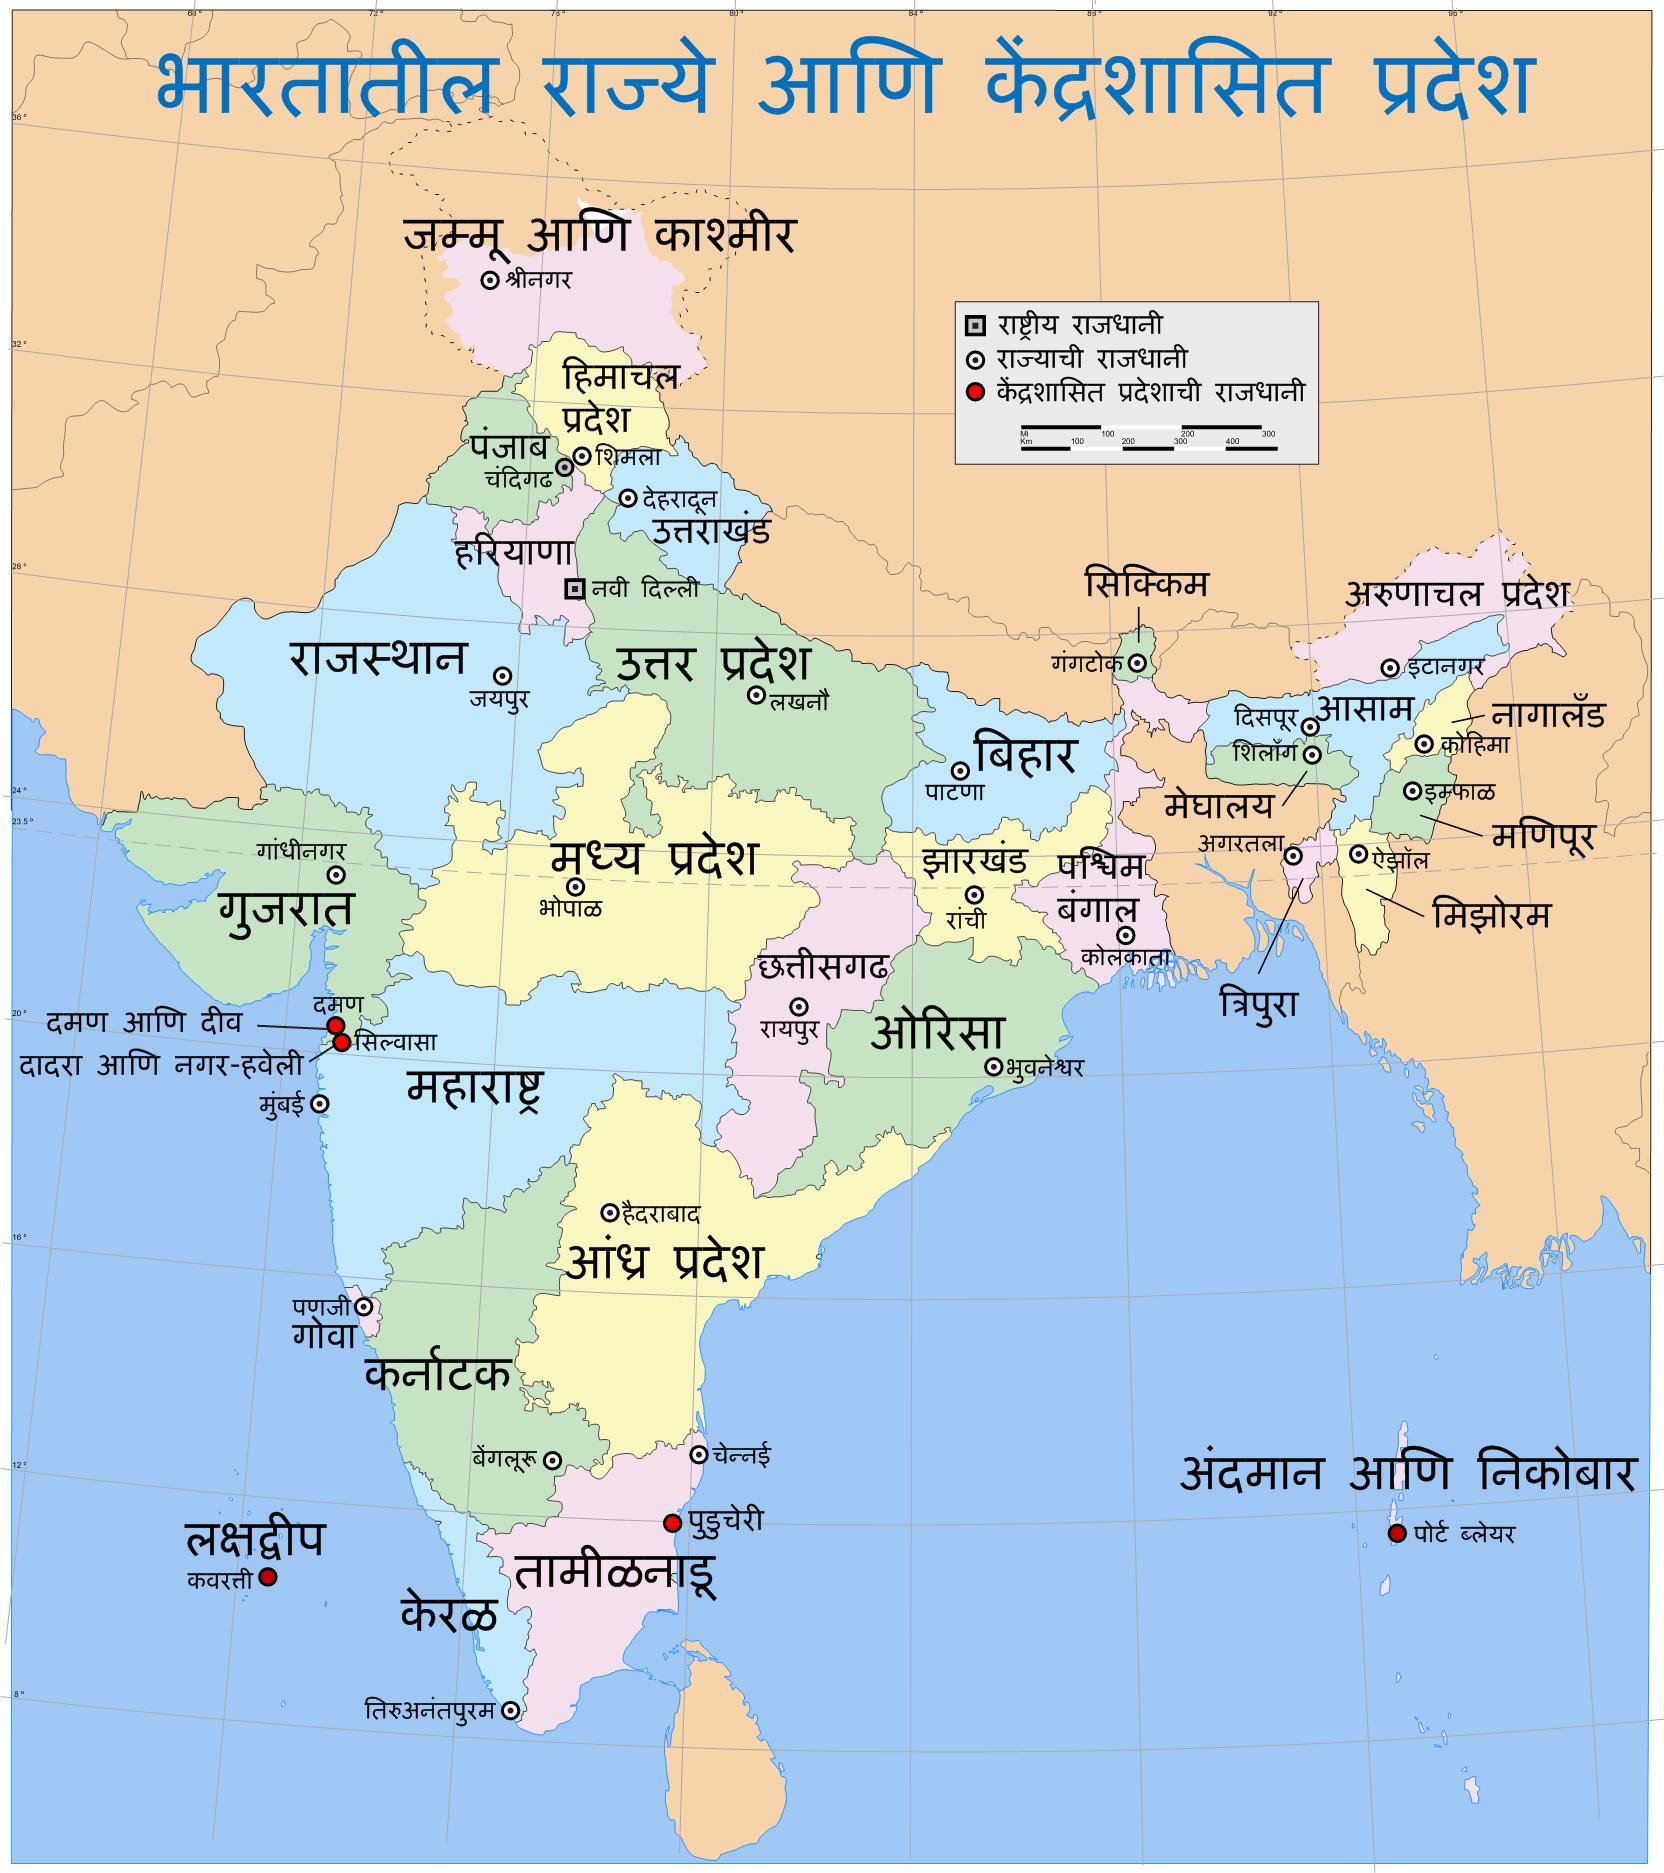 India States And Union Territories Map GeoGenius Pinterest - Chicago union map